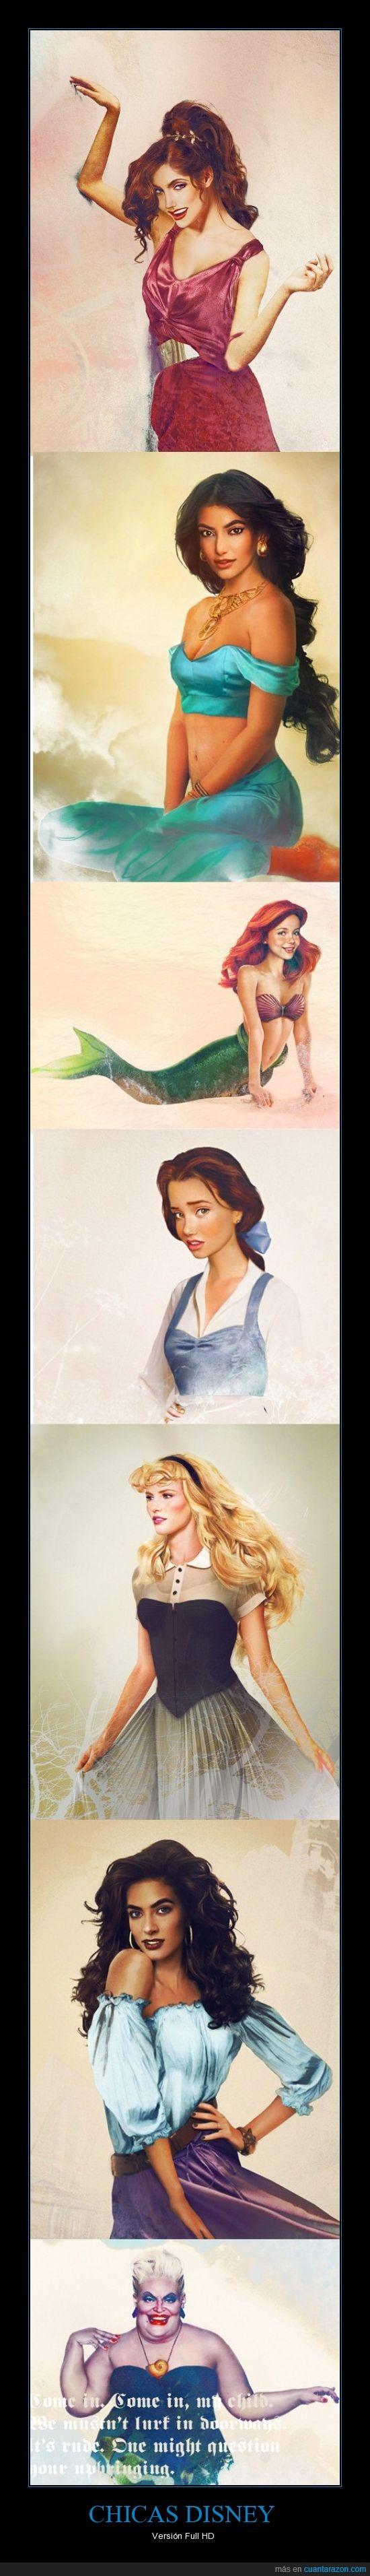 disney,hd,princesas,realista